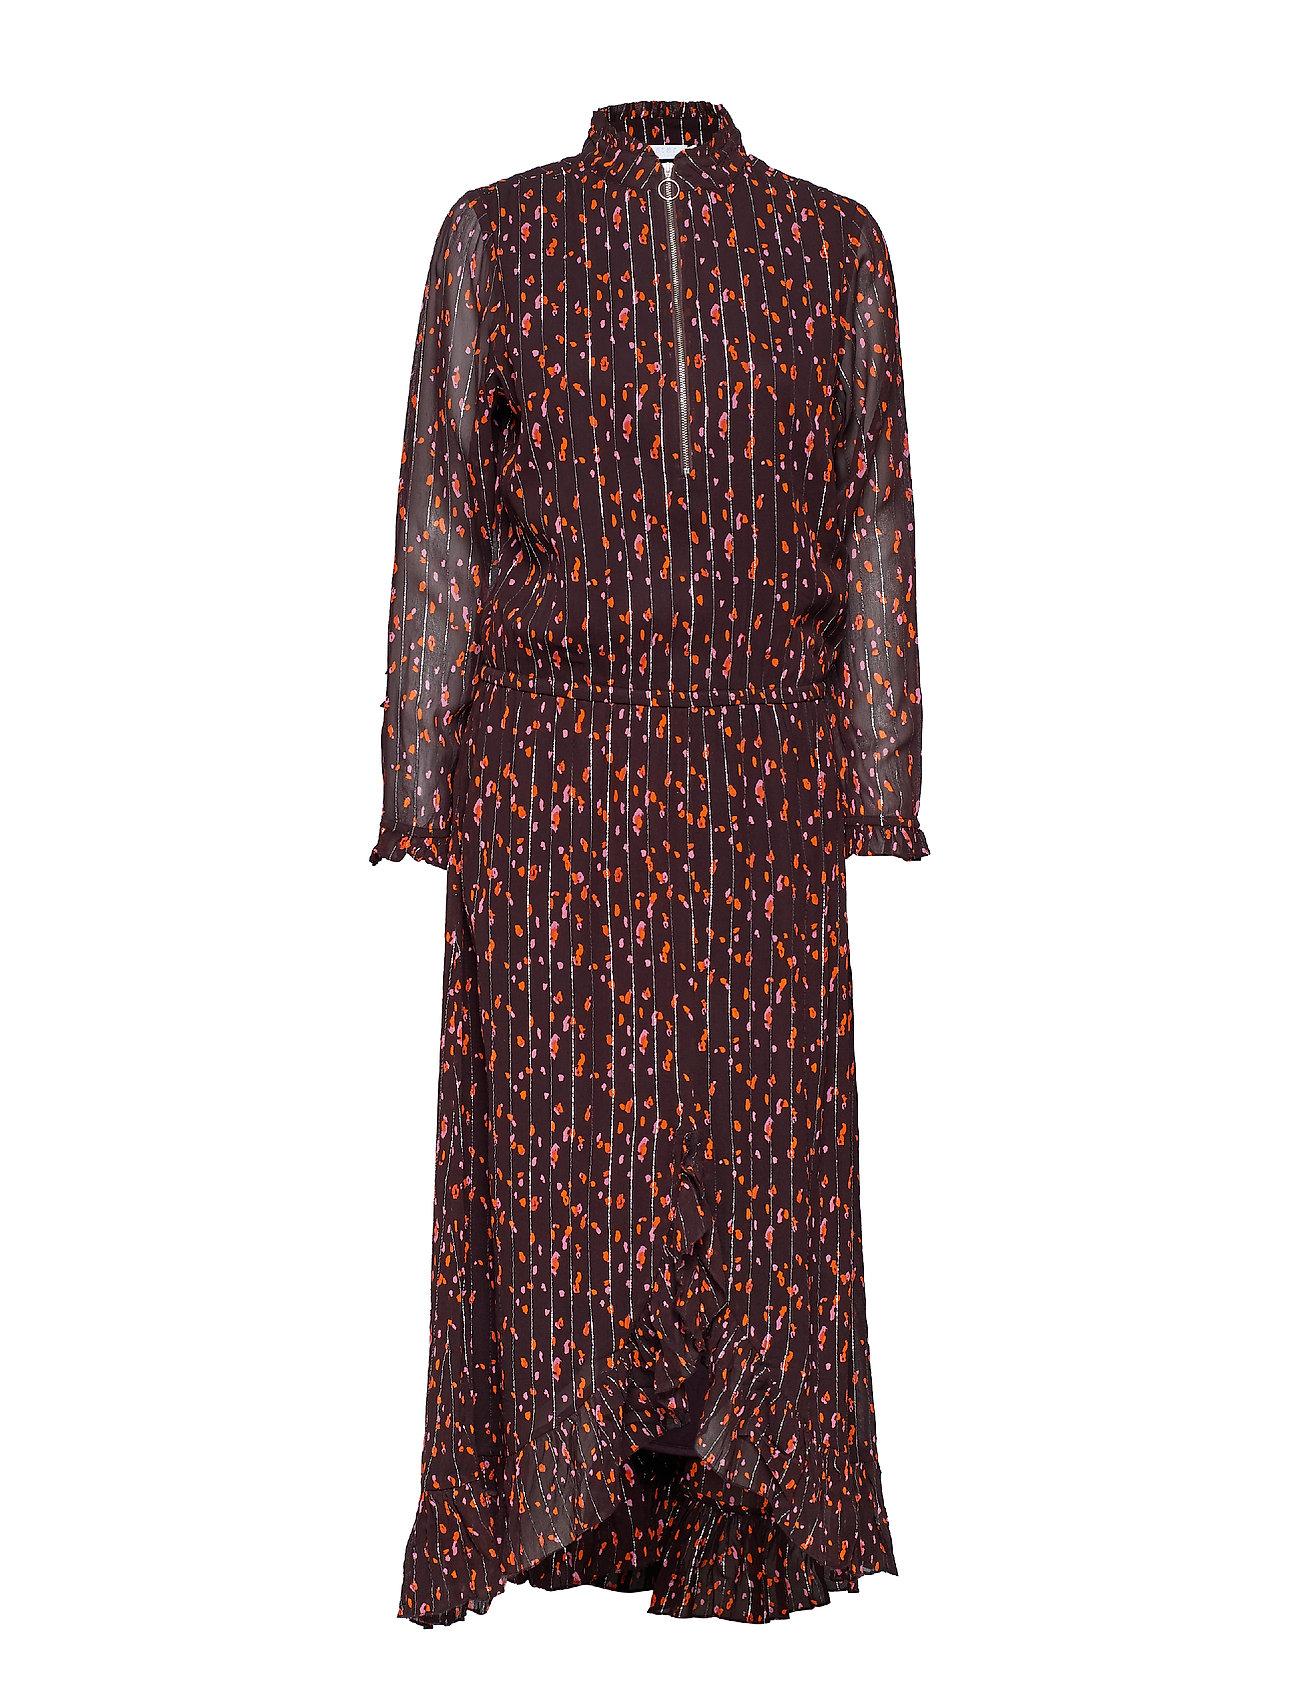 Dress In Seeds Print W. Ruffle - Coster Copenhagen